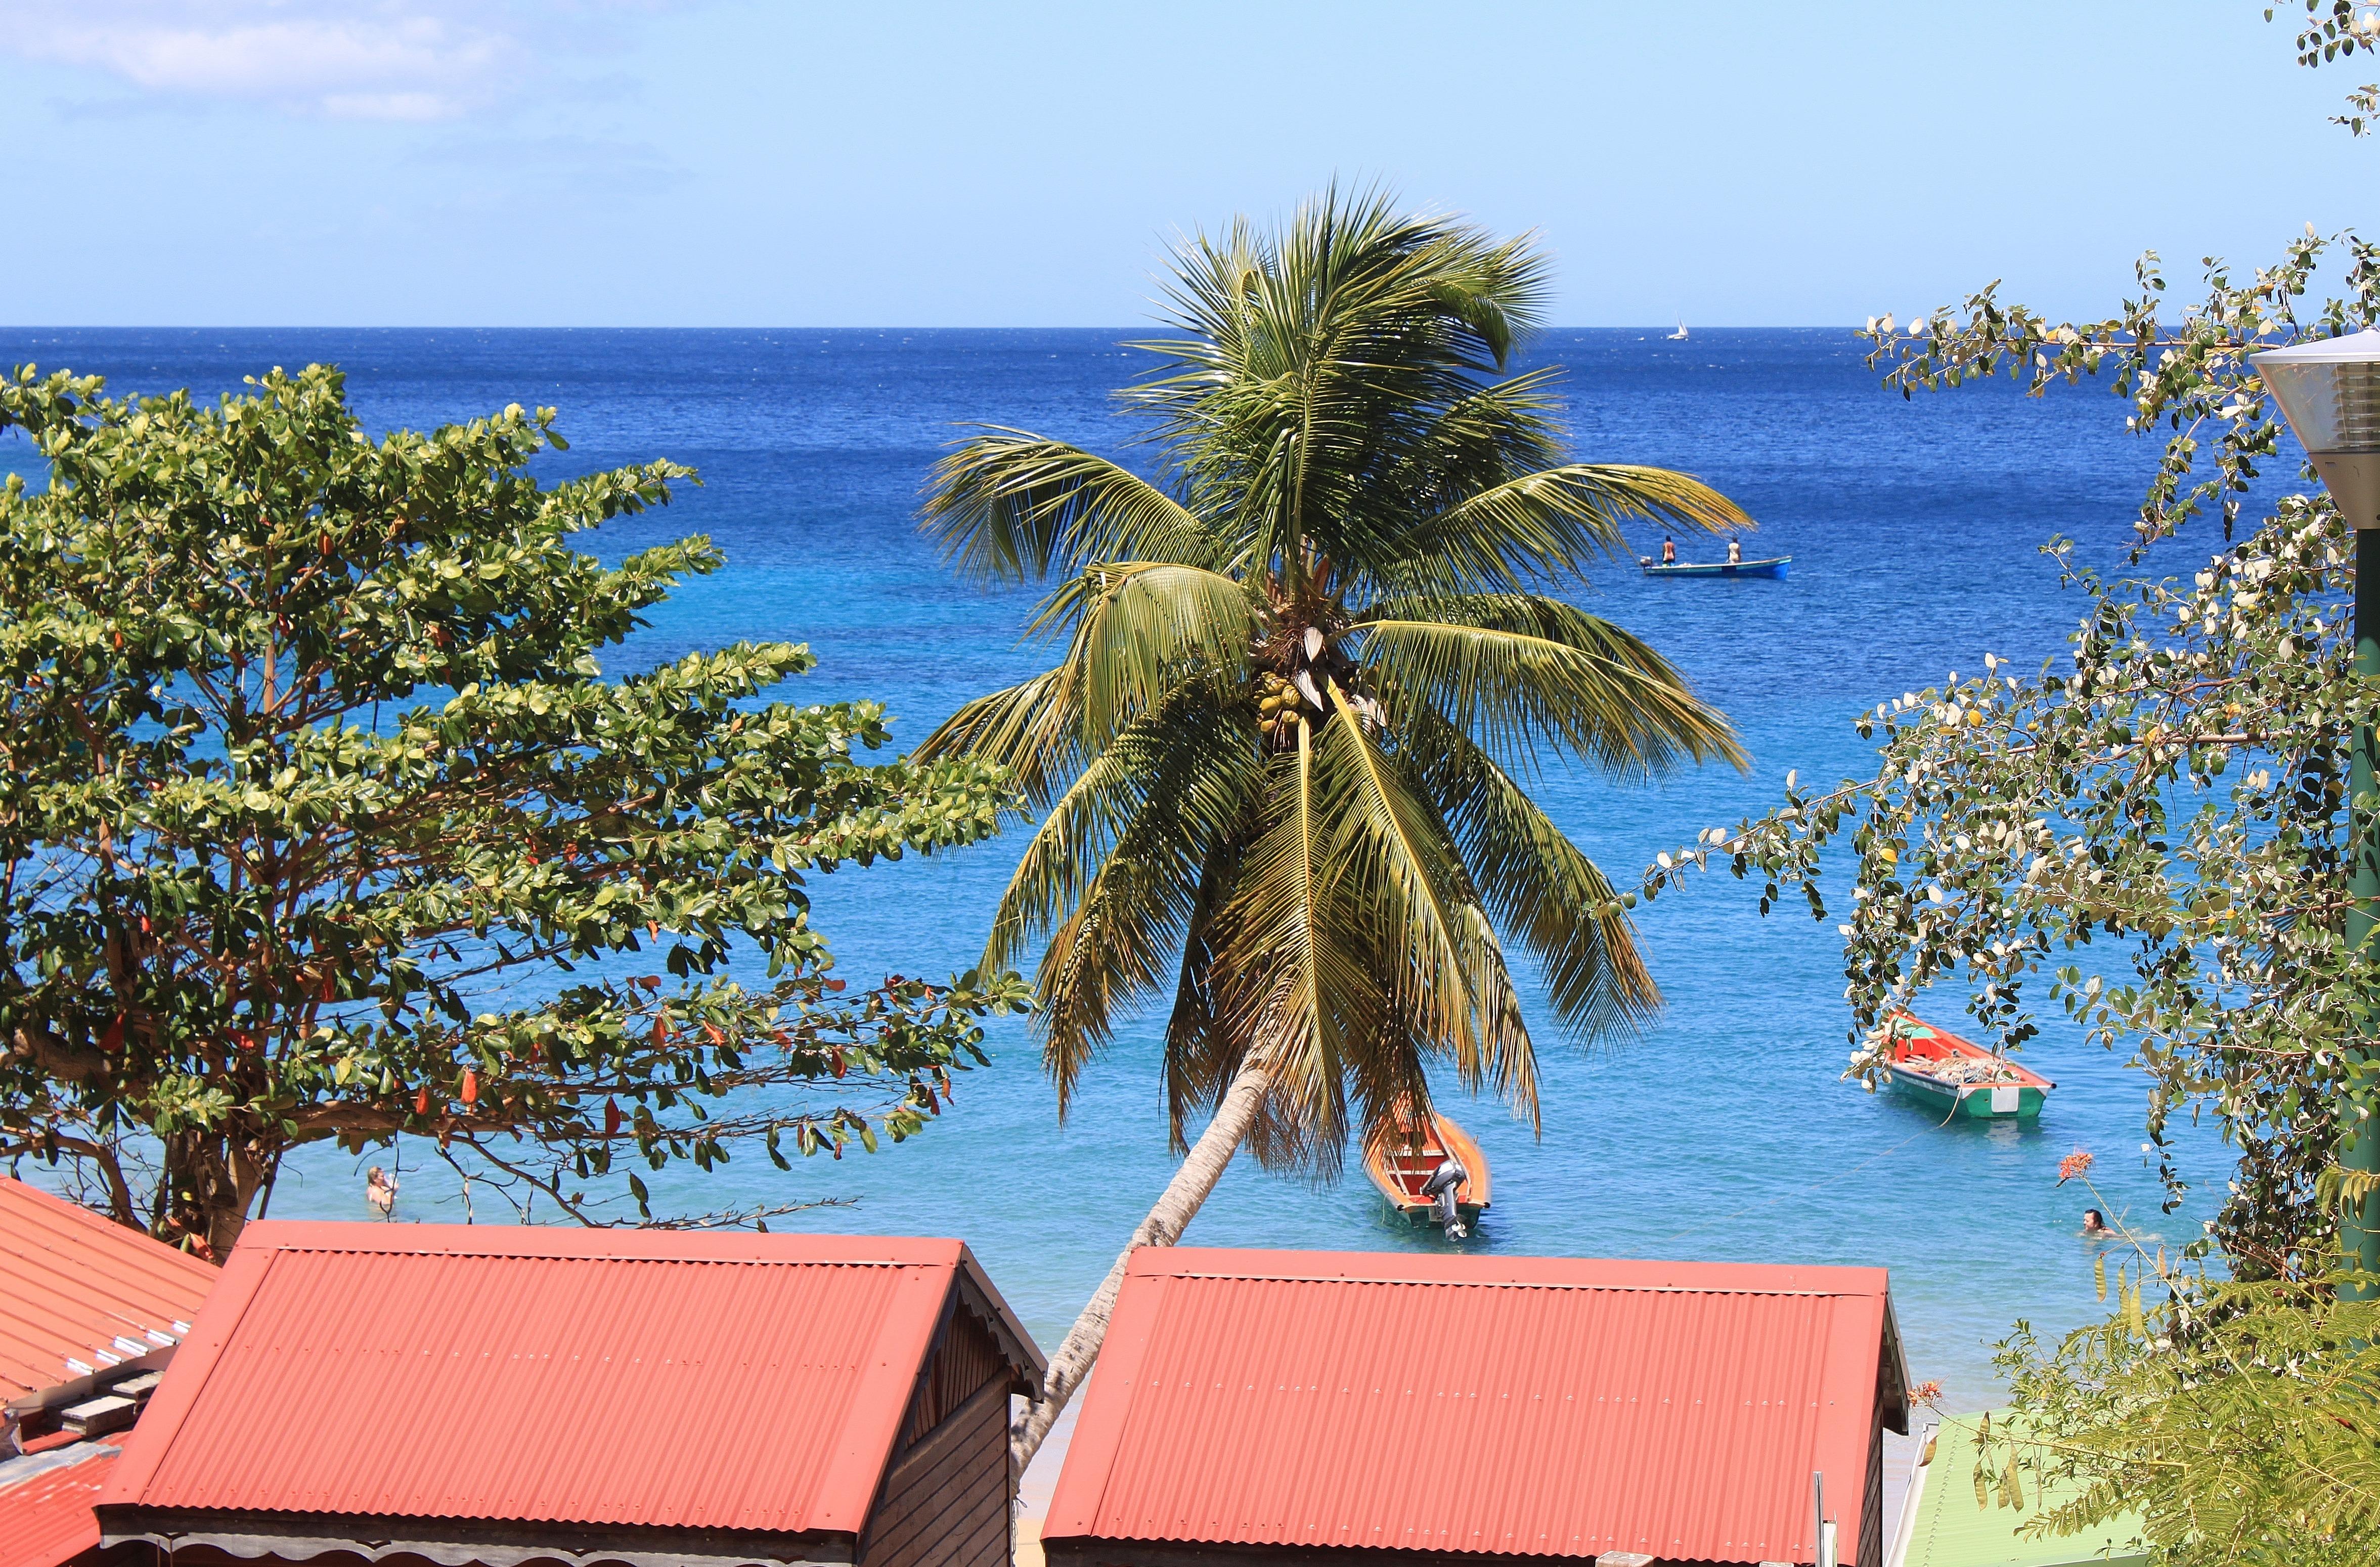 Beach Landscape Sea Coast Tree Water Ocean Plant Sky Palm Vacation Island Tourism Leisure Resort